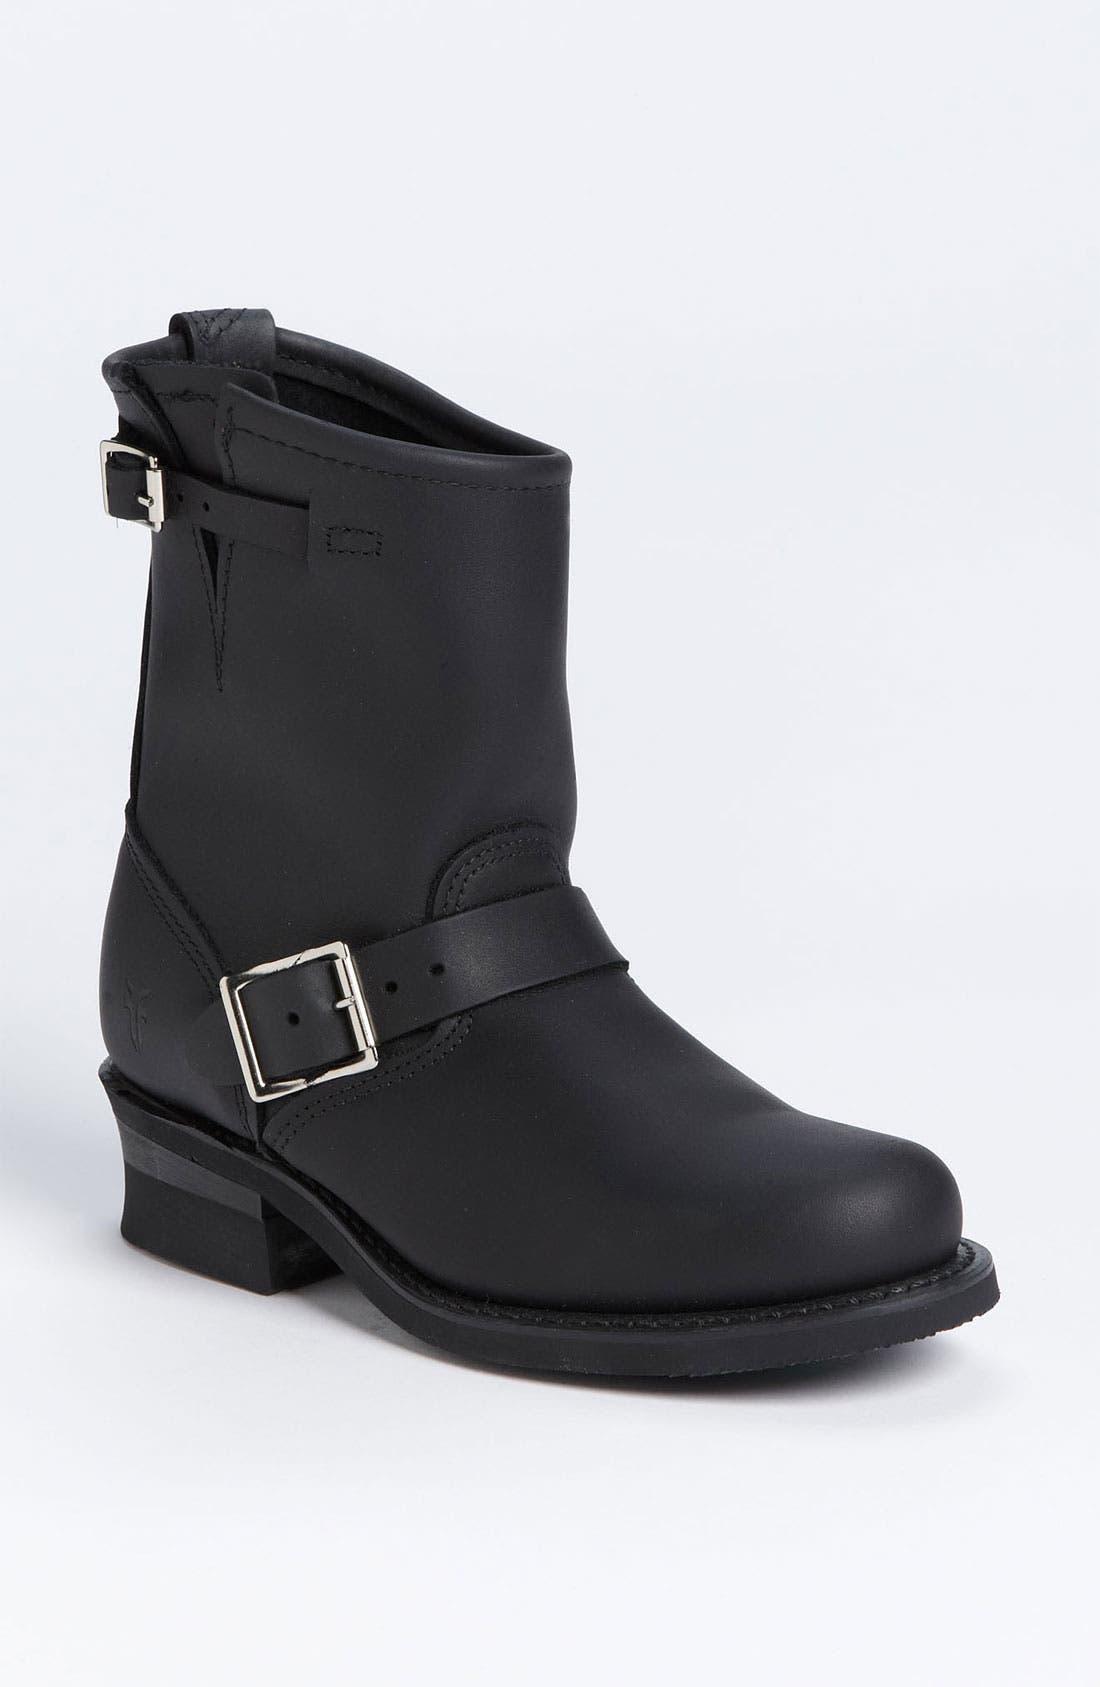 Main Image - Frye 'Engineer 8R' Leather Boot (Women)